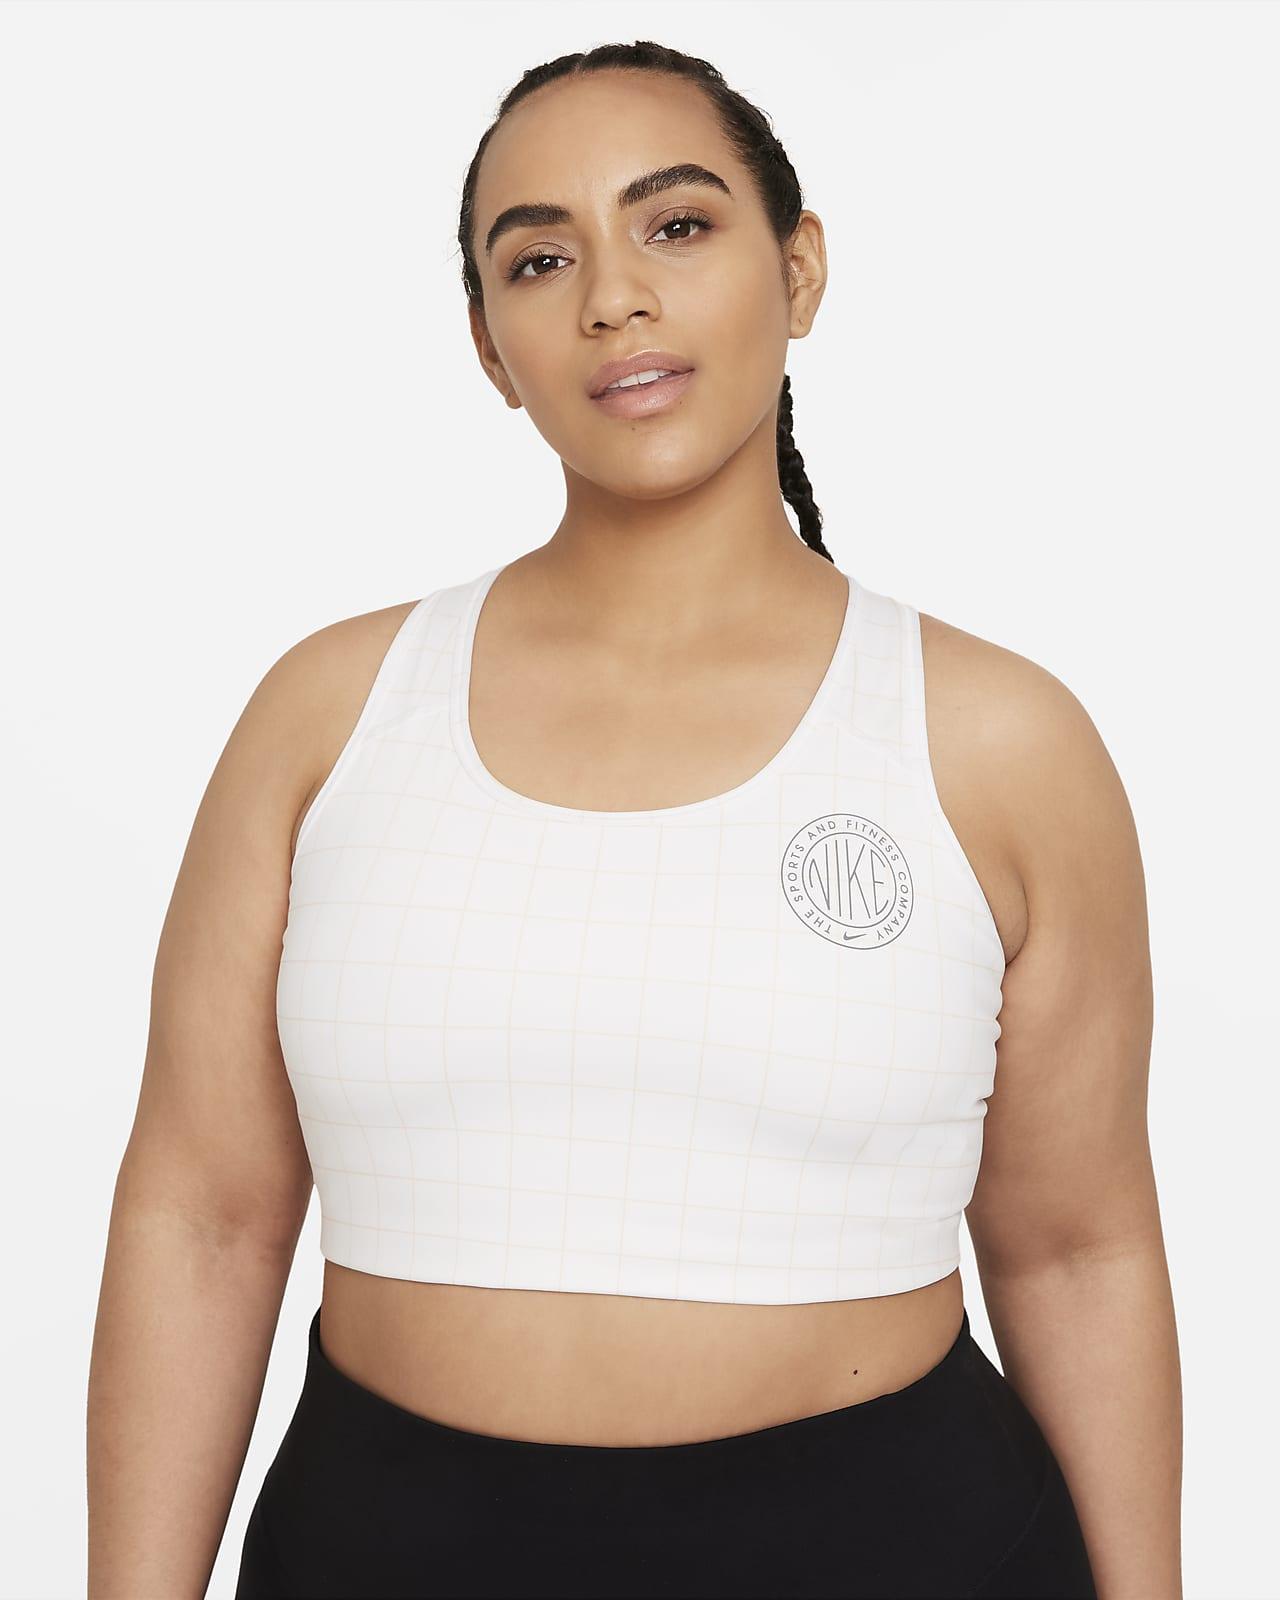 Nike Dri-FIT Swoosh Femme Women's Medium-Support Non-Padded Printed Sports Bra (Plus Size)